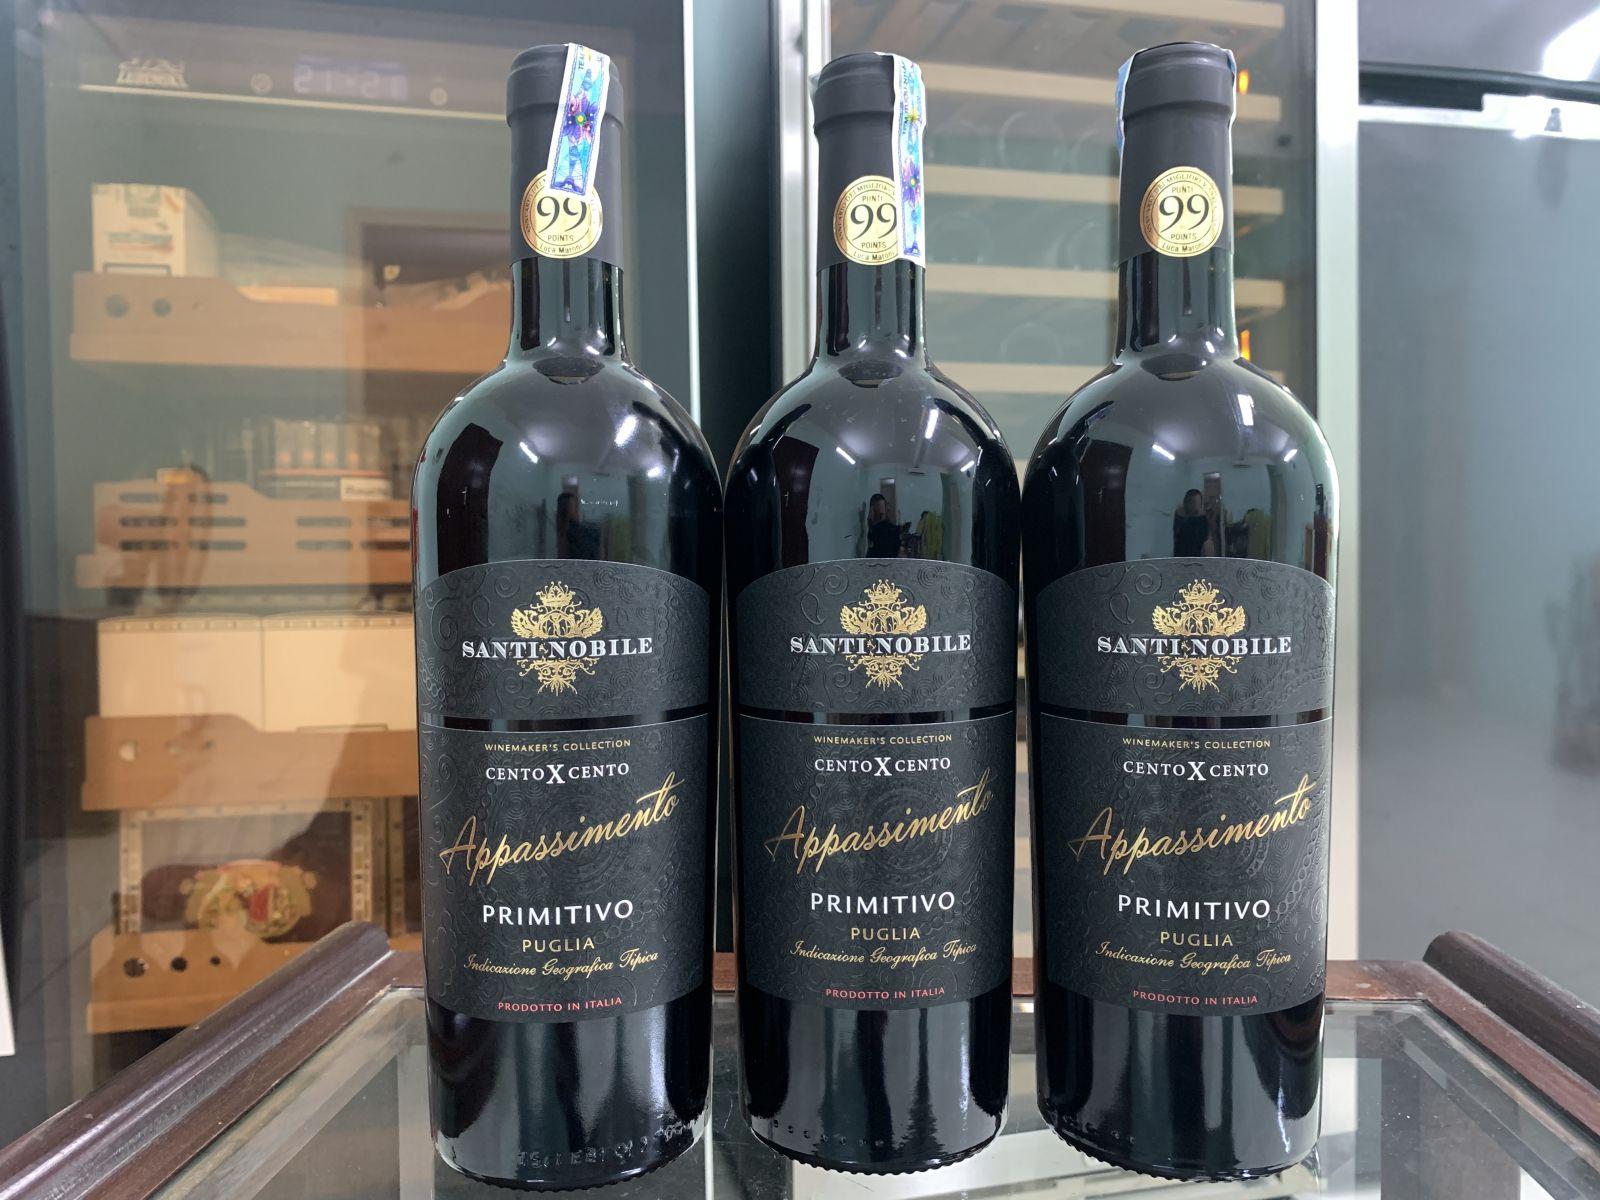 Rượu vang Ý Santi Noble Cento X Cento Appassimento Primitivo 2015